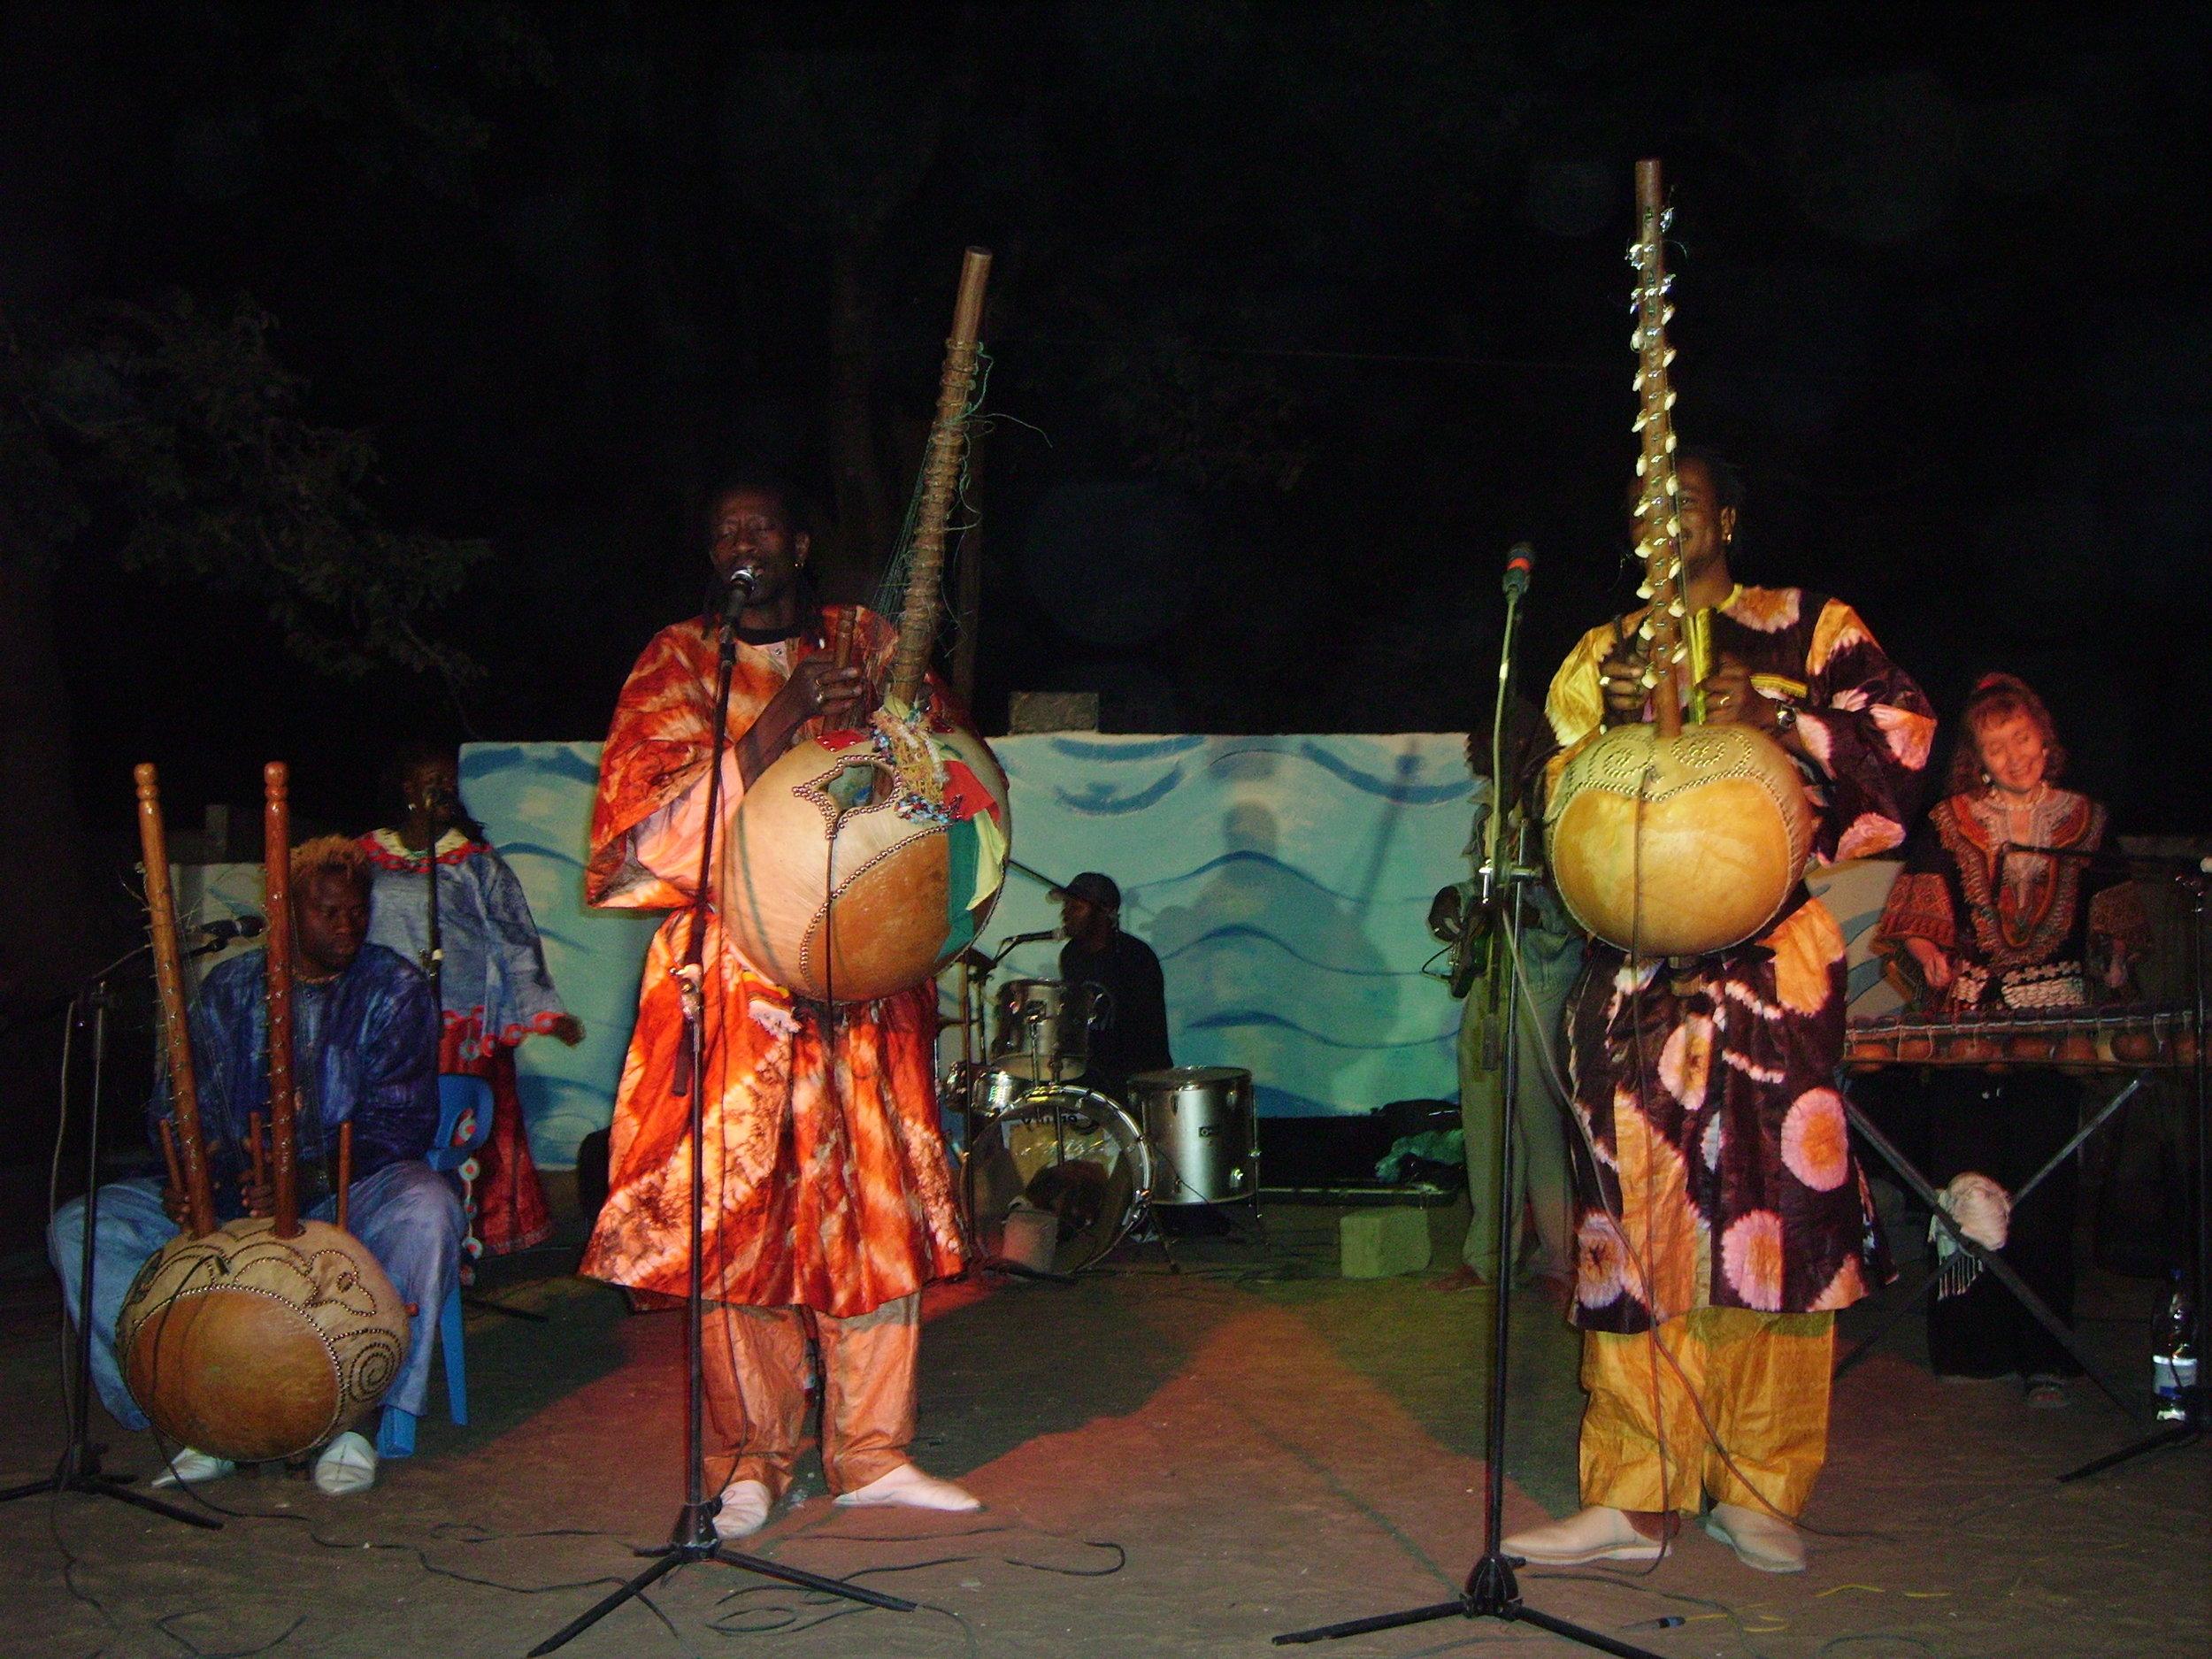 Sadio Cissokho, Solo Cissokho and Fily Cissokho performing at Abene Festival 2010.